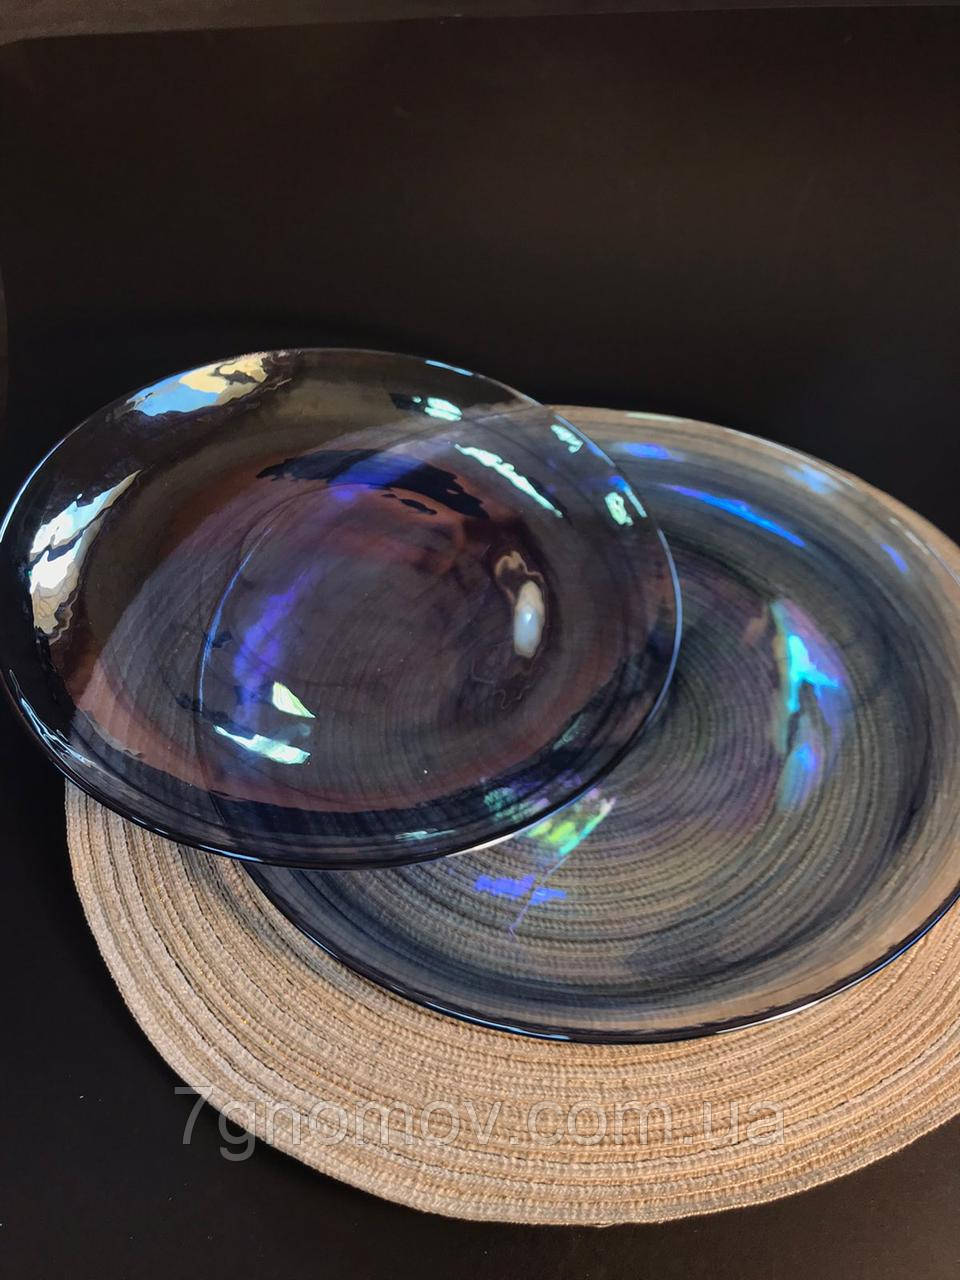 Набор 6 стеклянных обеденных тарелок прозрачно-синий Океан 27 см арт. 16112-14 - фото 4